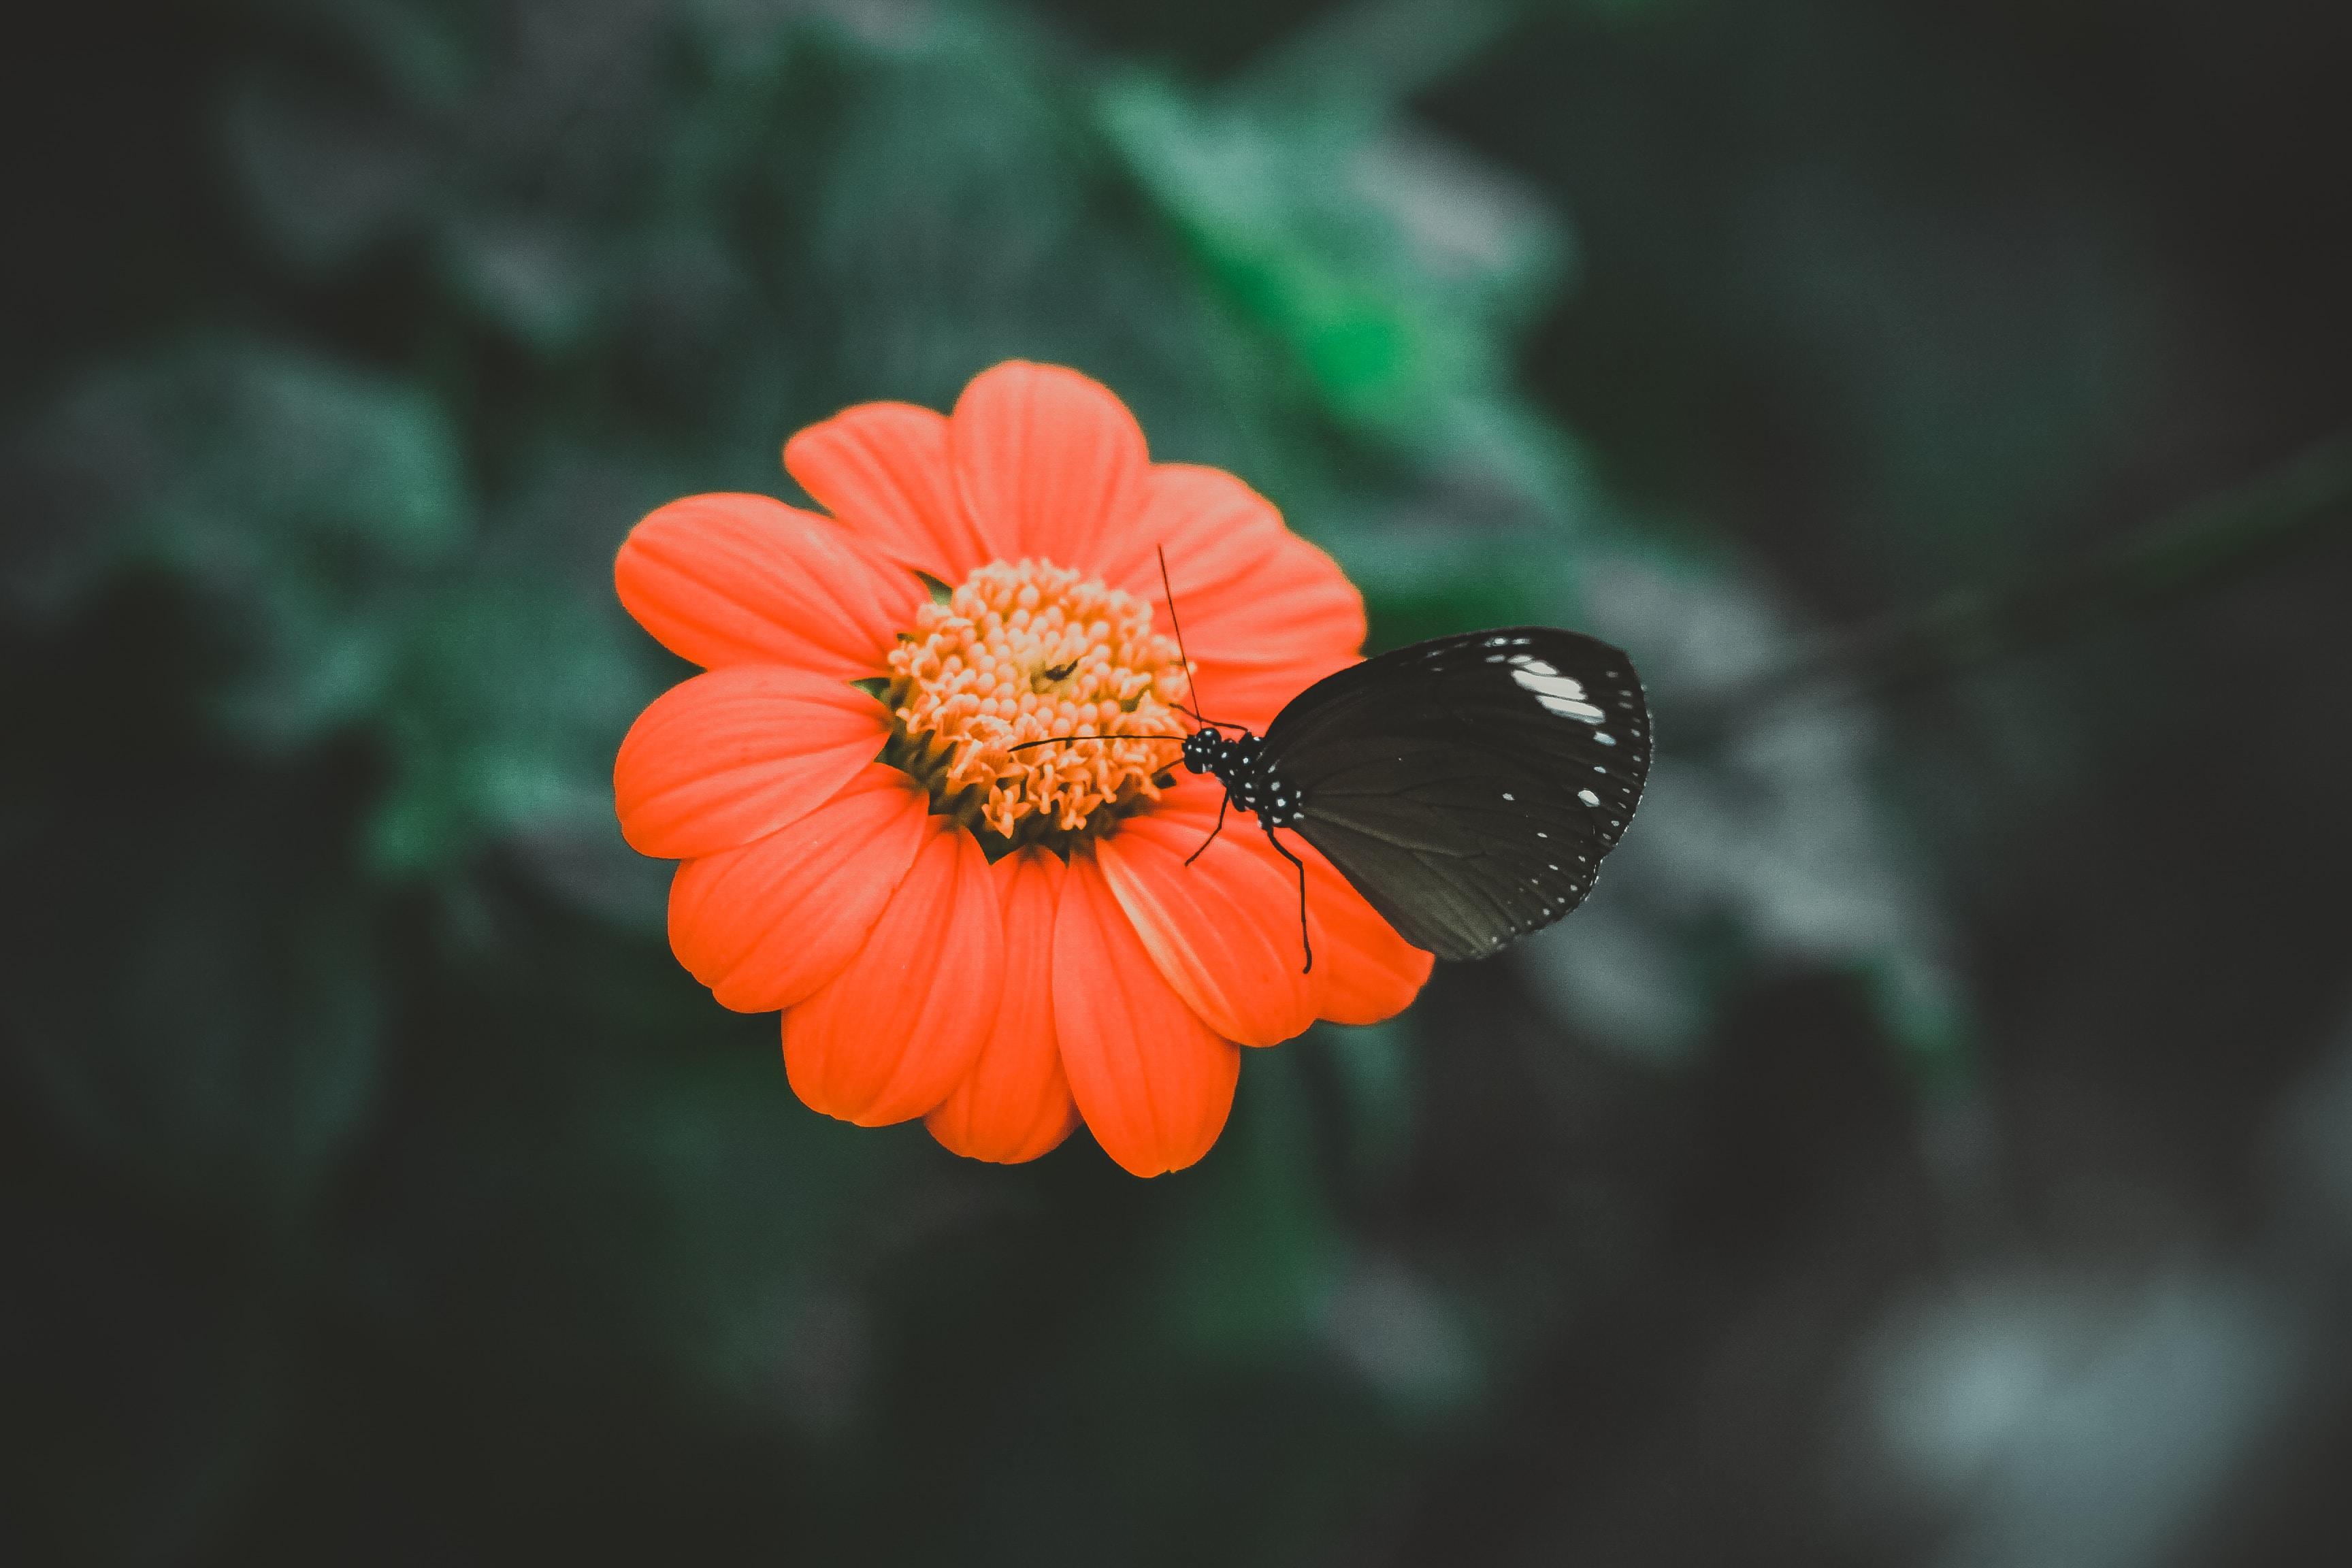 Images Wallpaper » Flower Wallpaper